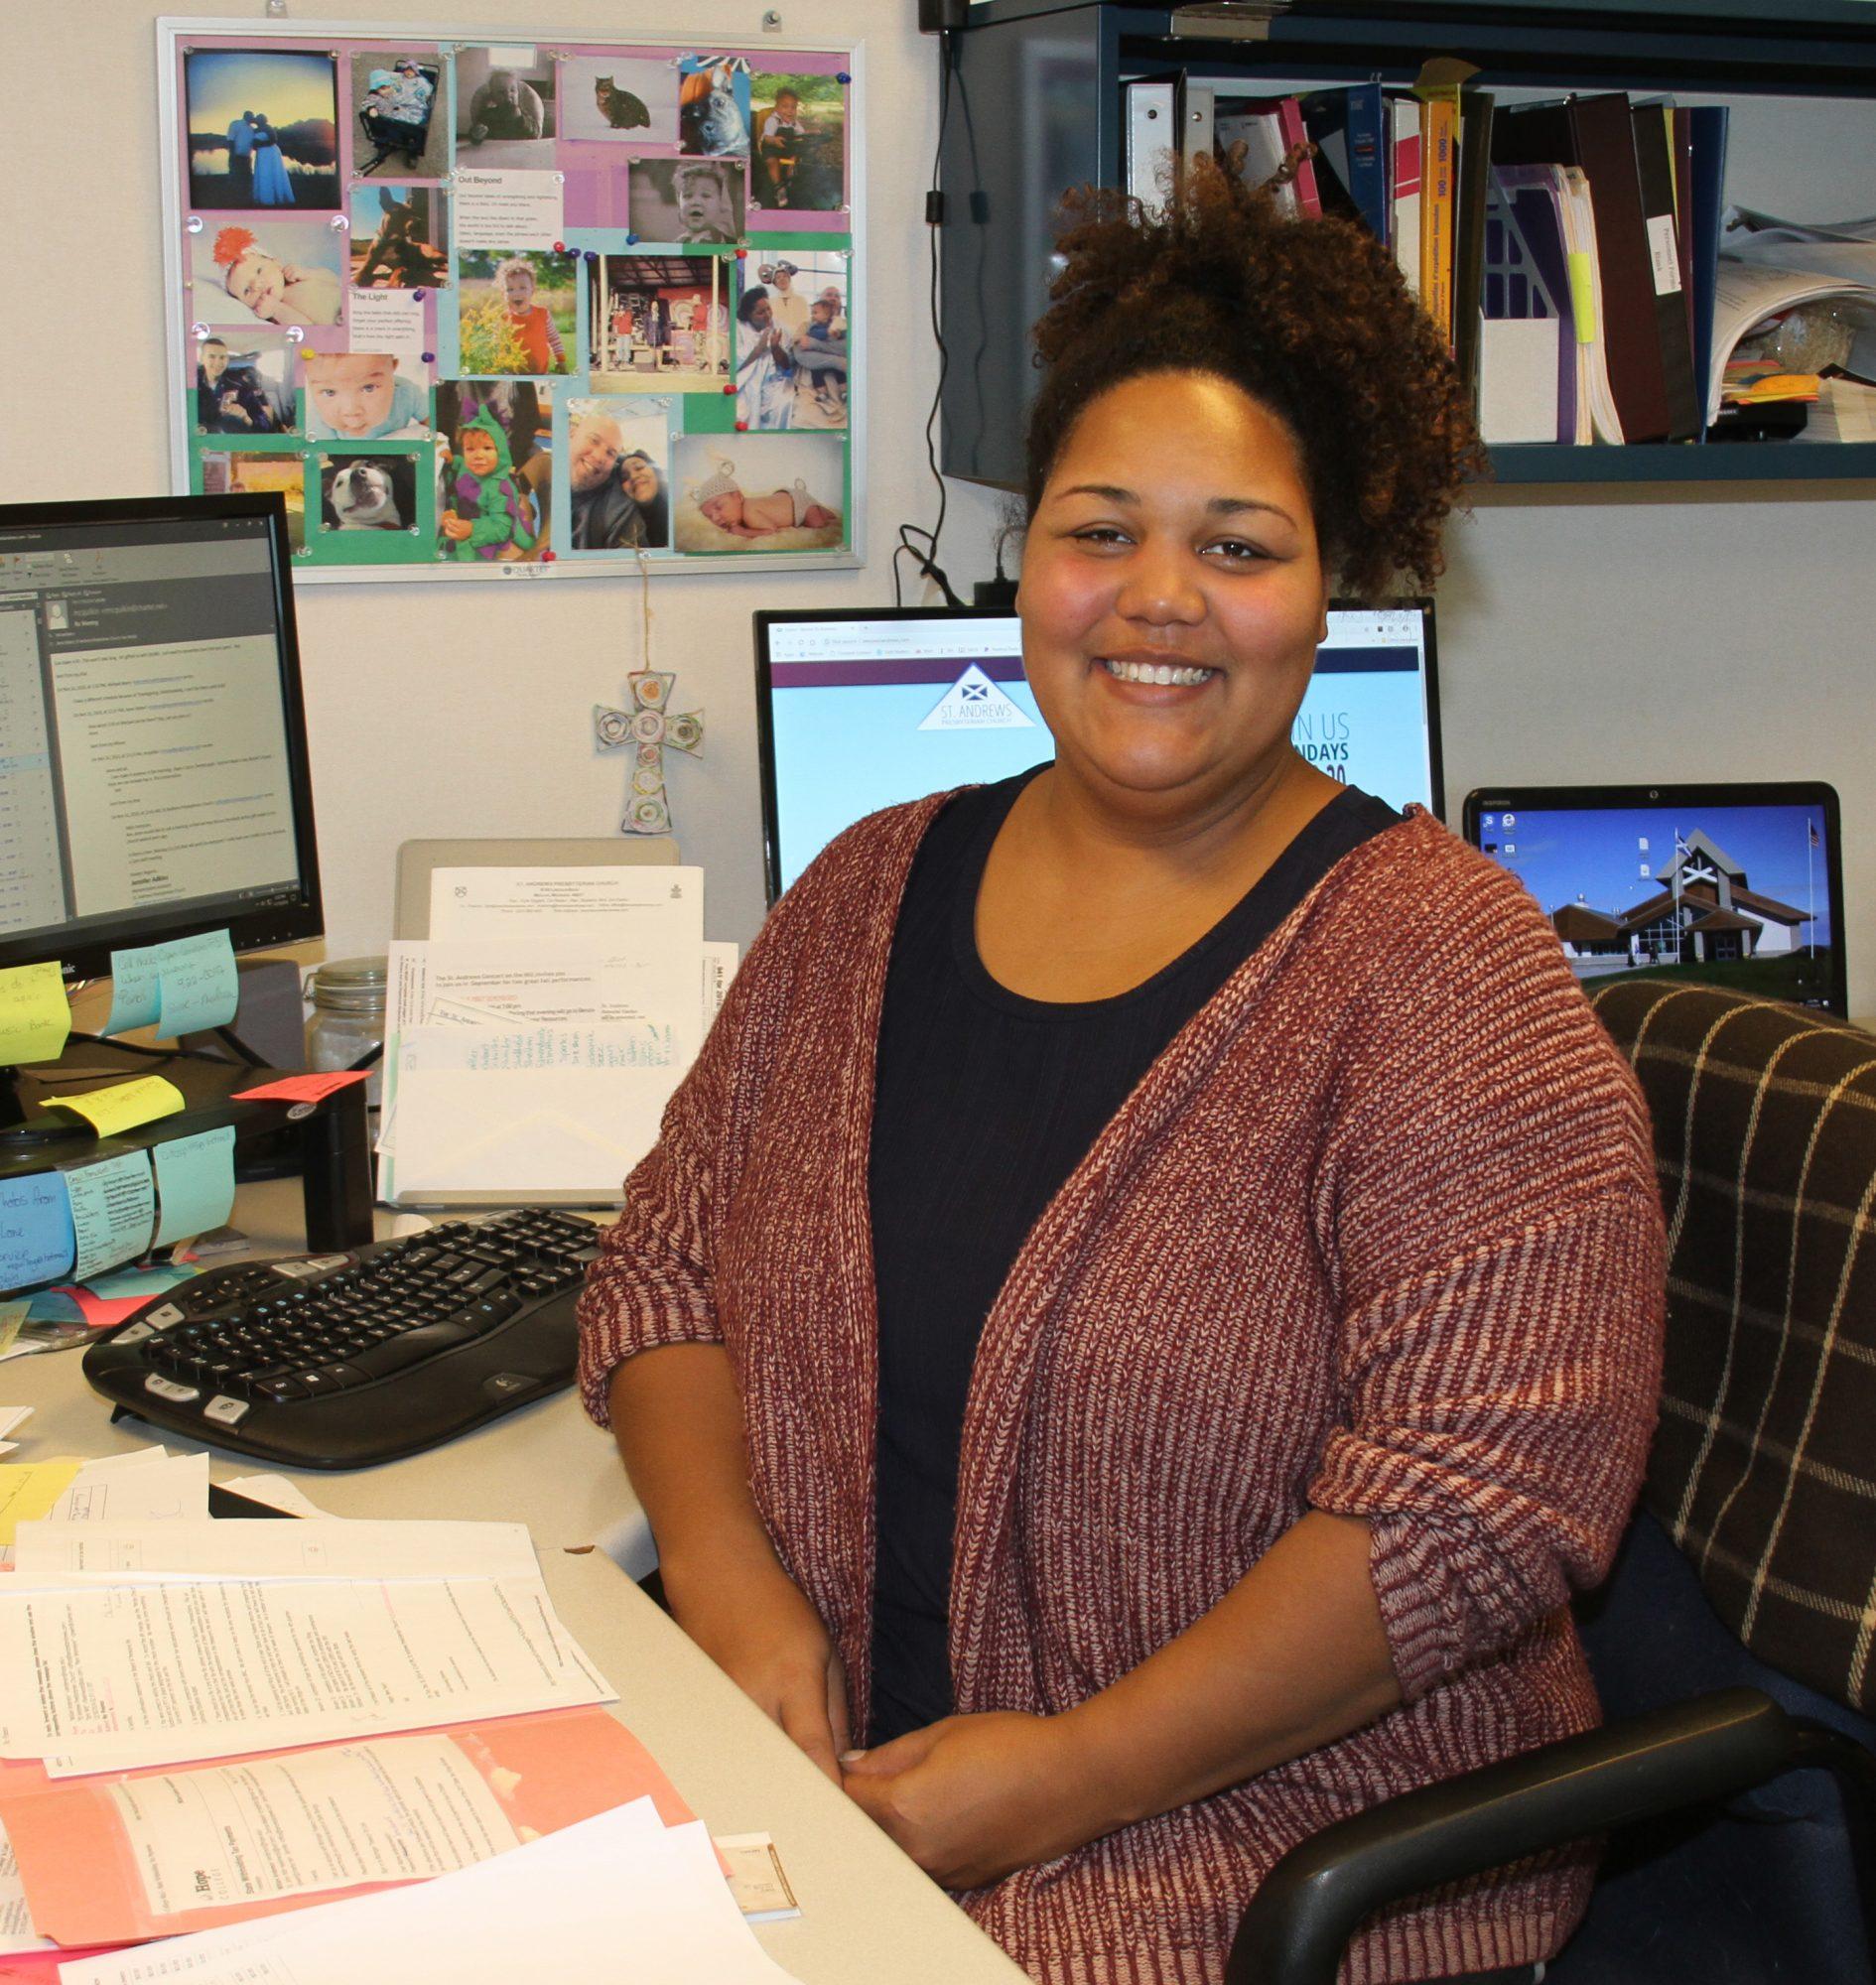 ST. ANDREWS PRESBYTERIAN CHURCH - Jennifer Adkins, Administrative Assistant